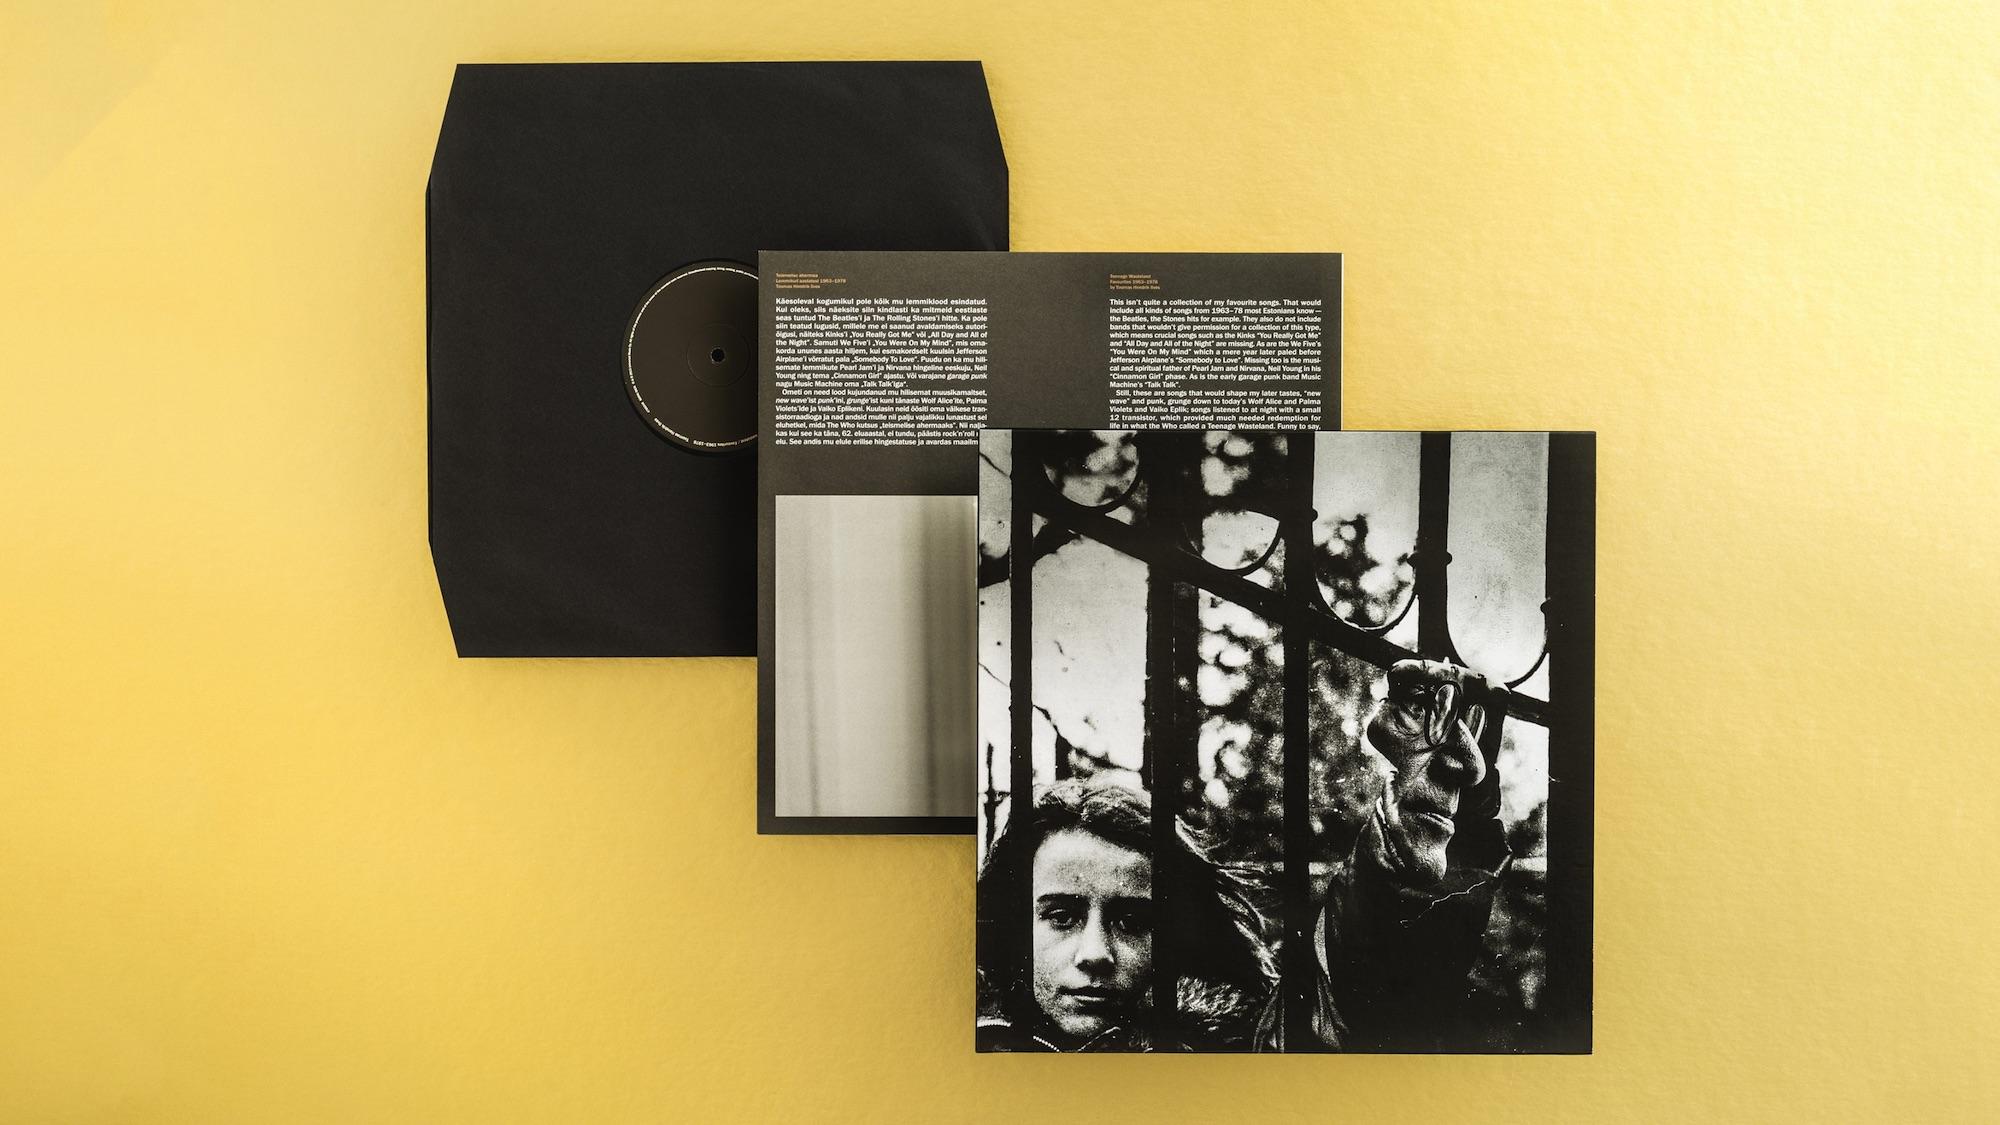 estonian president album packaging7